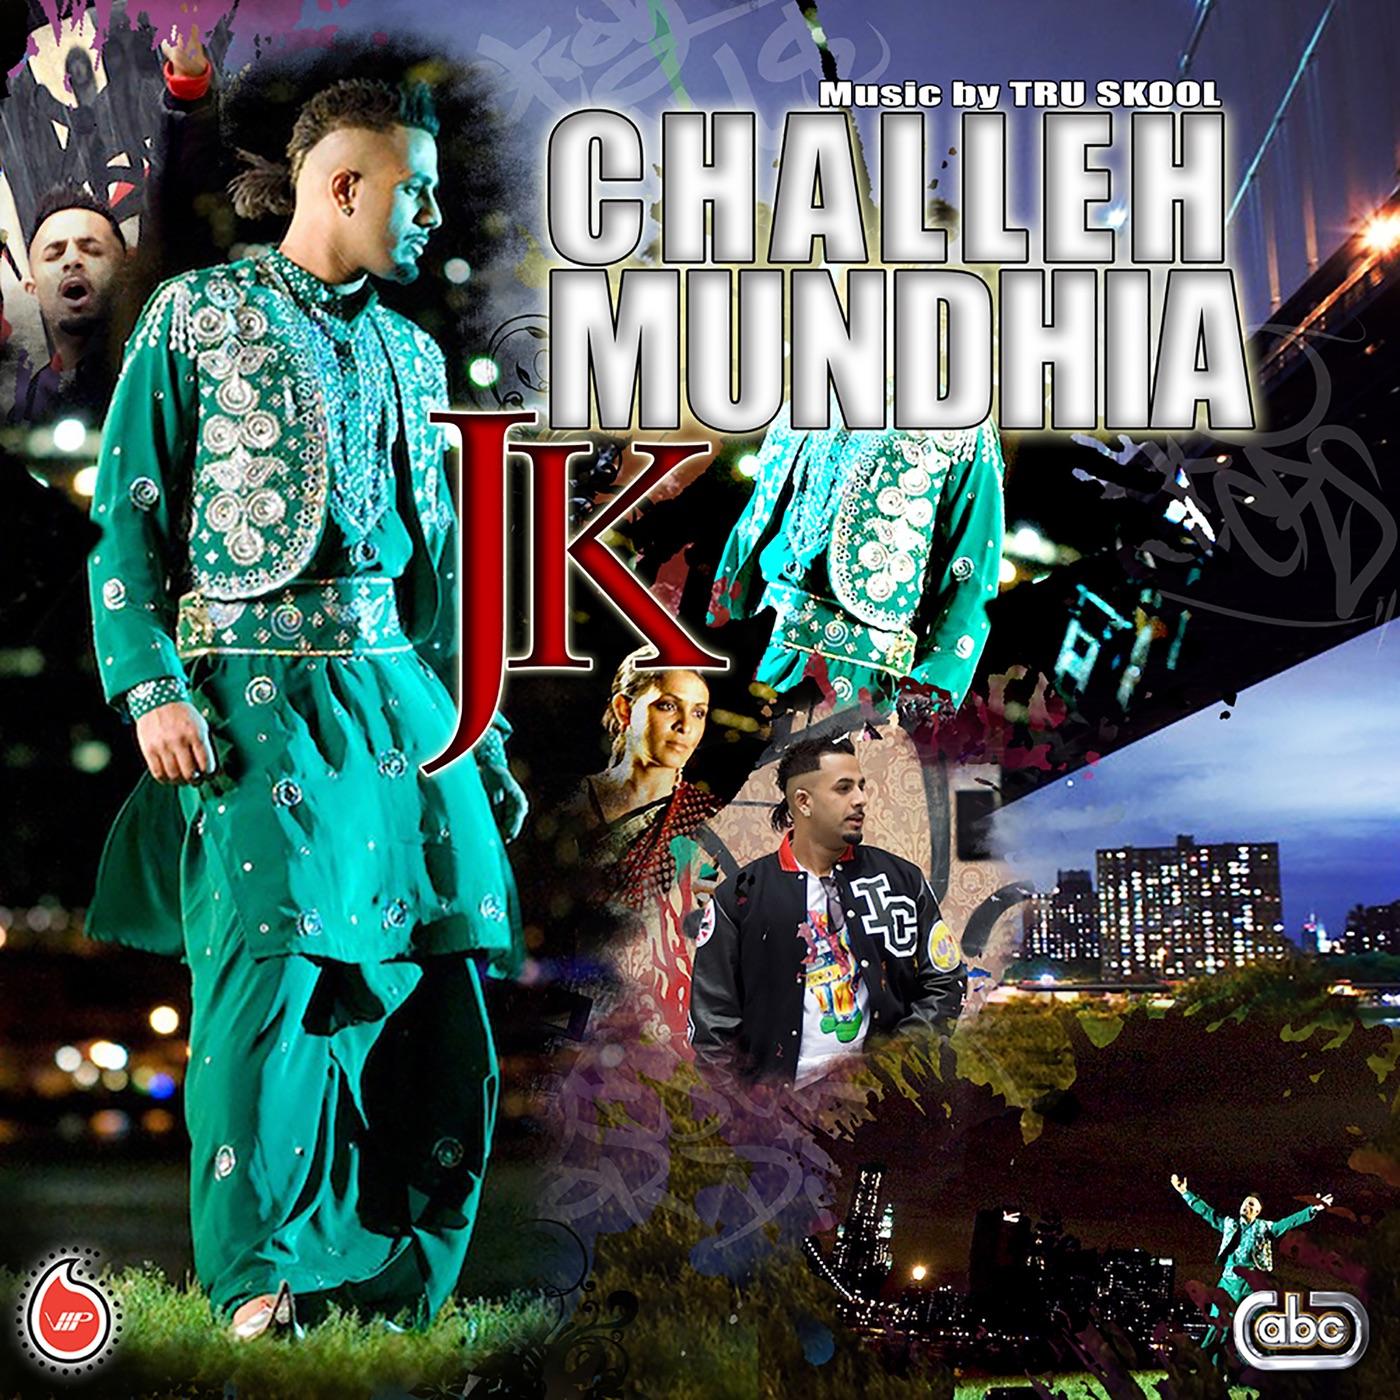 Challeh Mundhia - Single